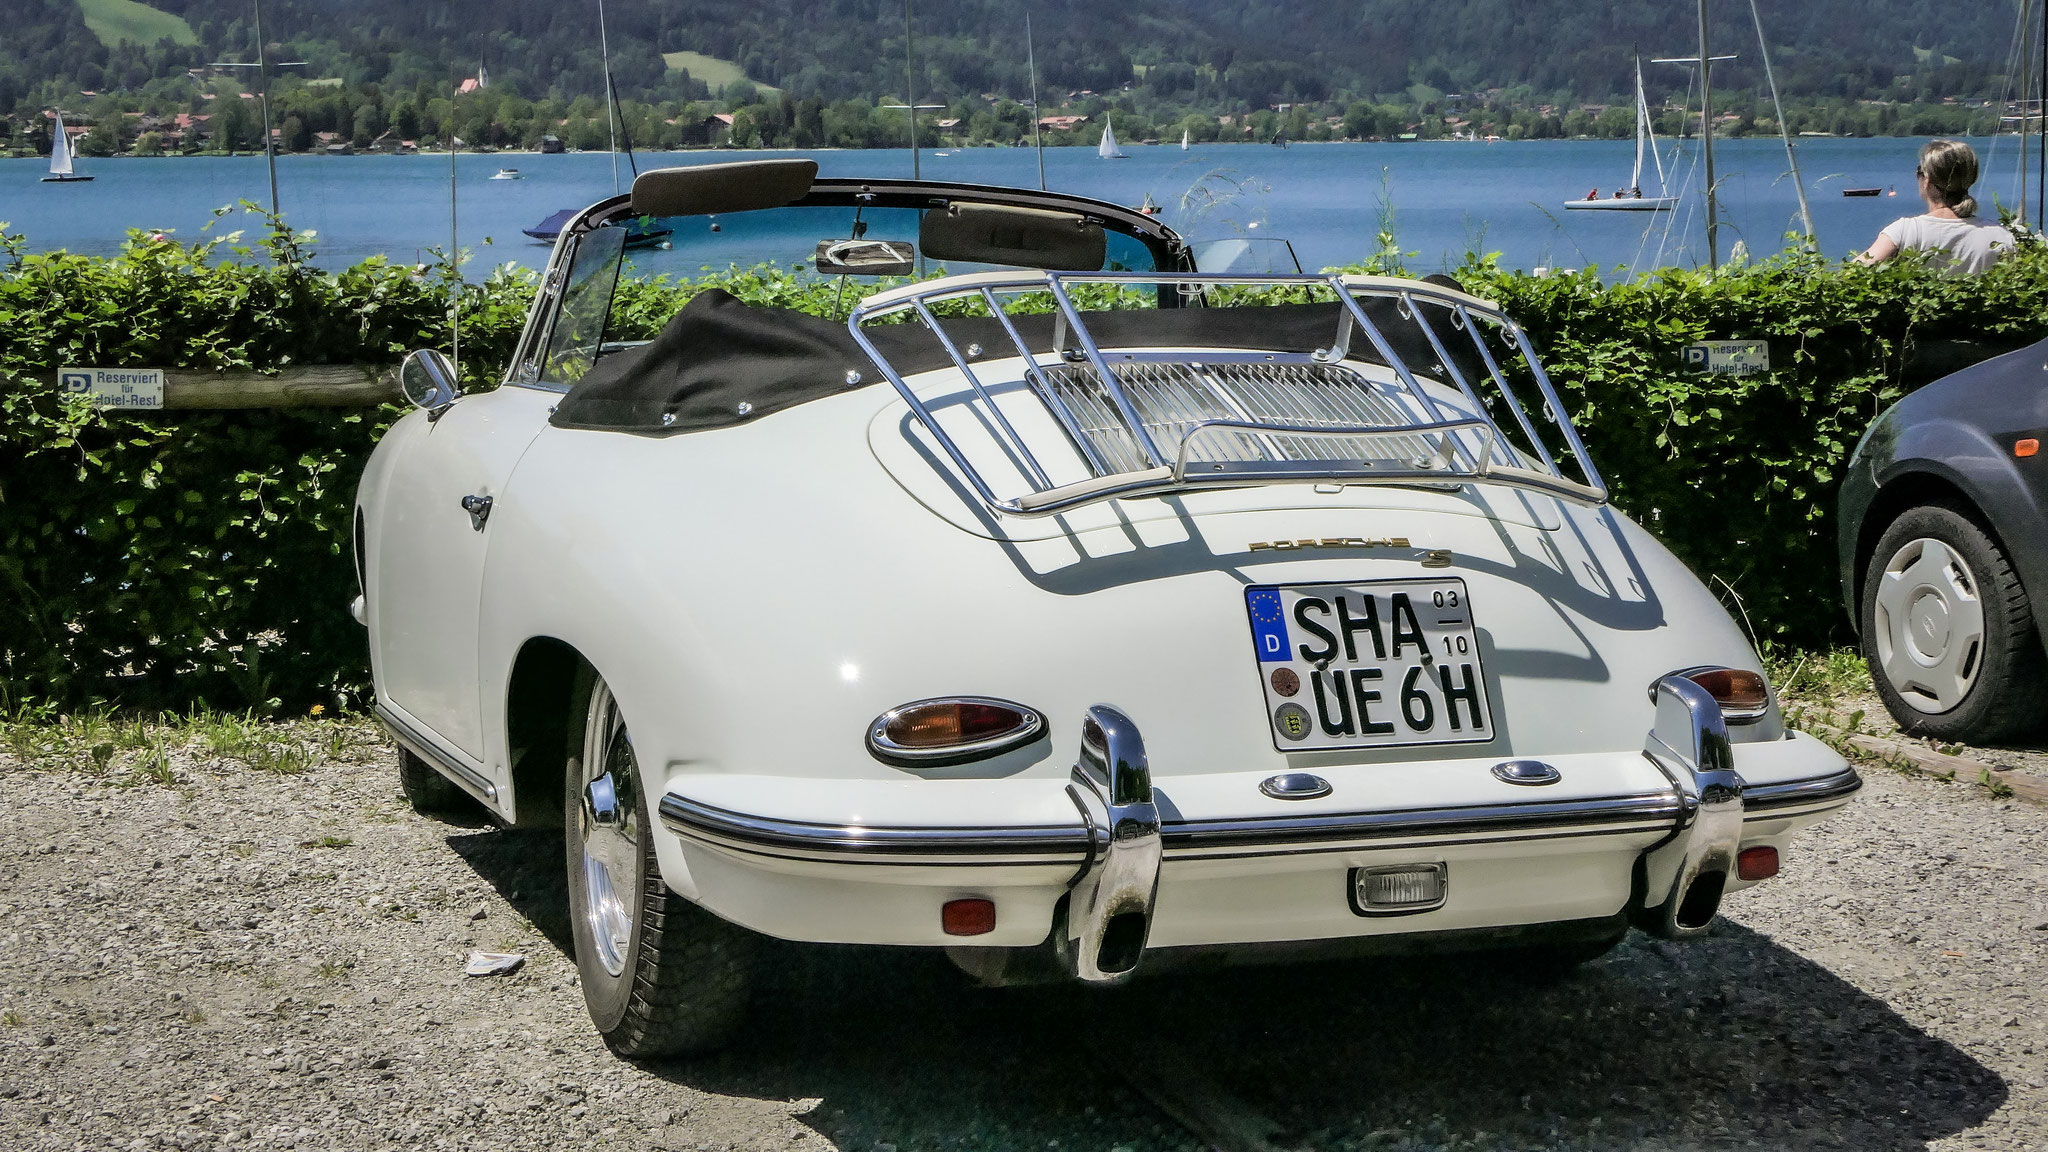 Porsche 356 S - SHA-UE-6H